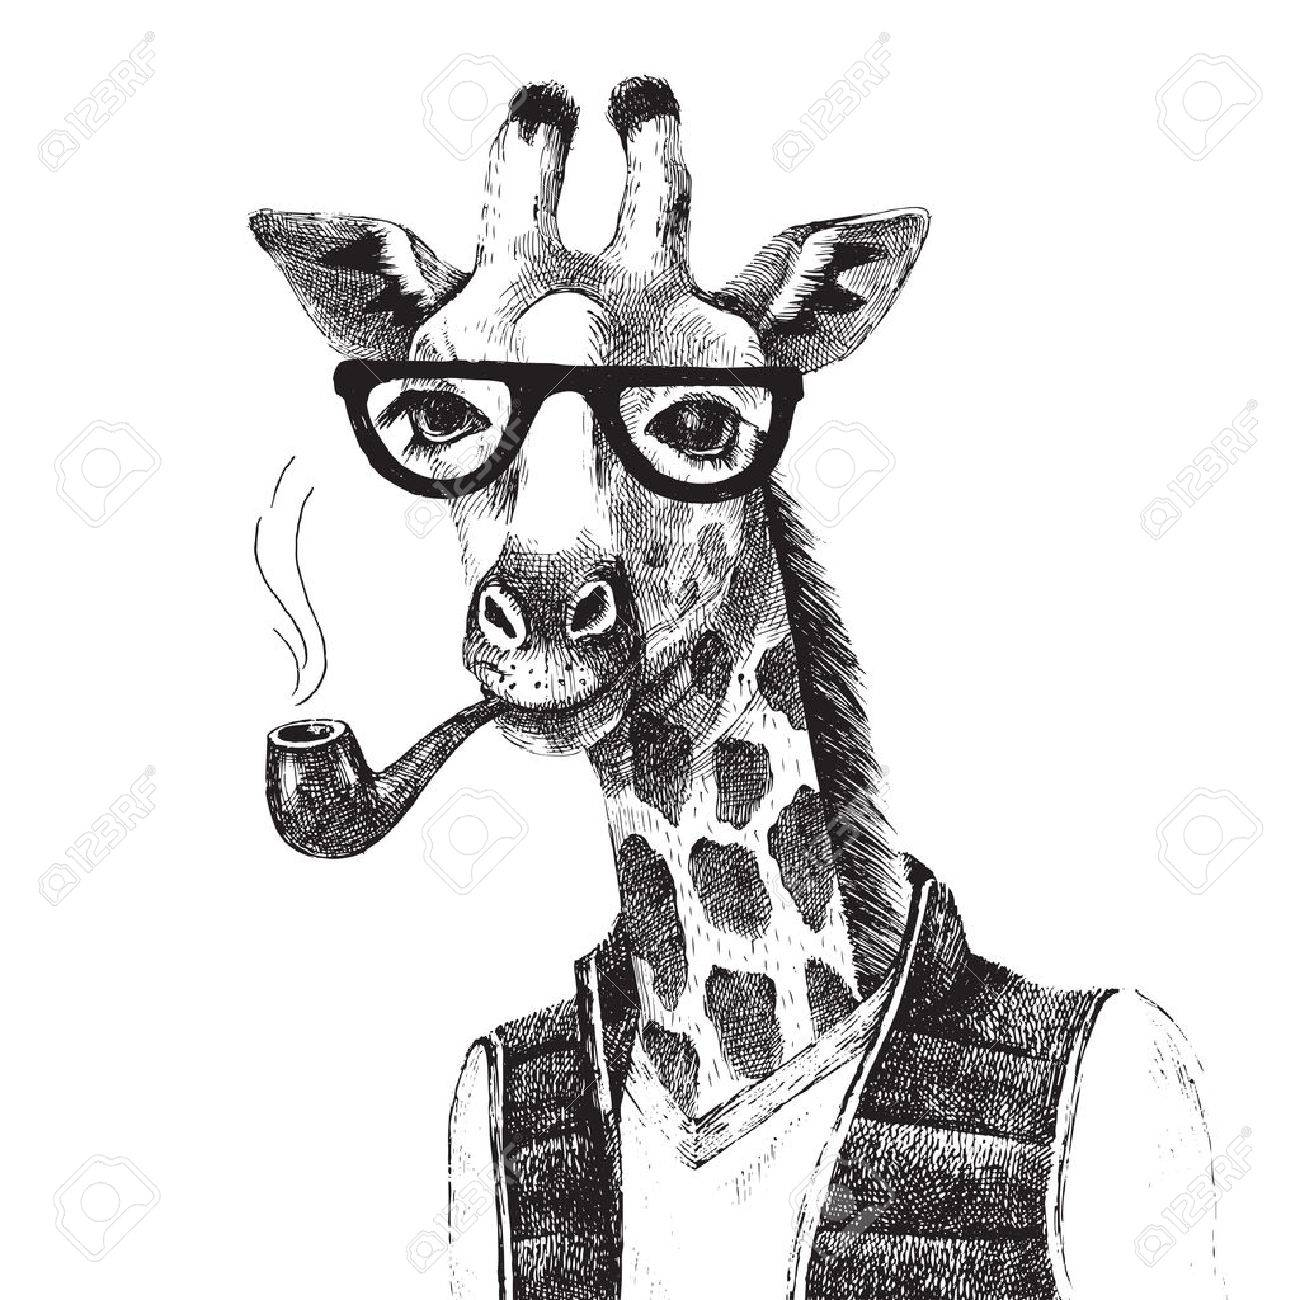 Hand drawn Illustration of dressed up giraffe hipster - 51908621